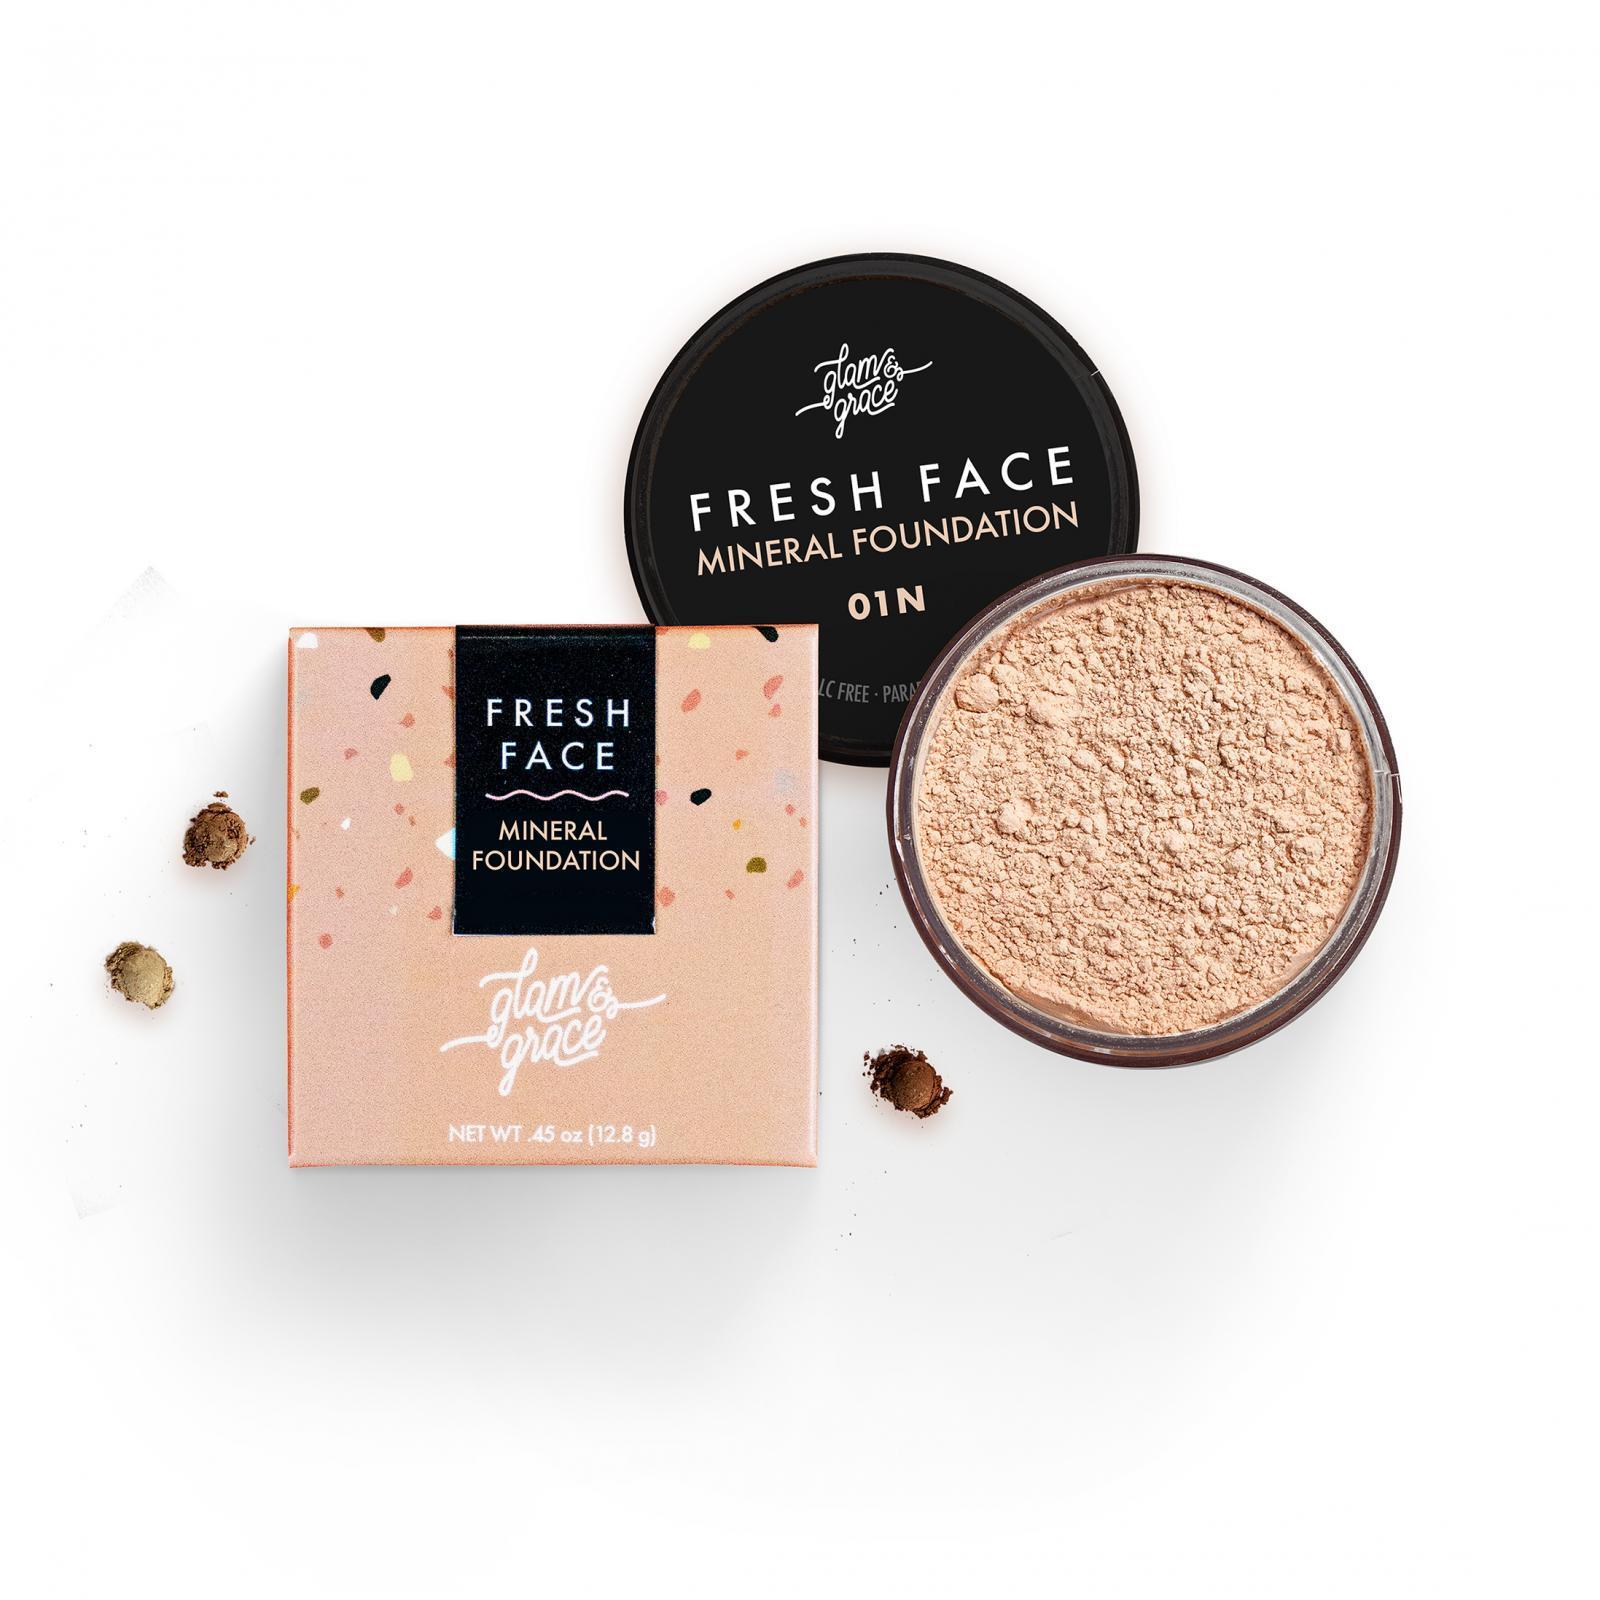 FRESH FACE Mineral Foundation Powder - Light 01N